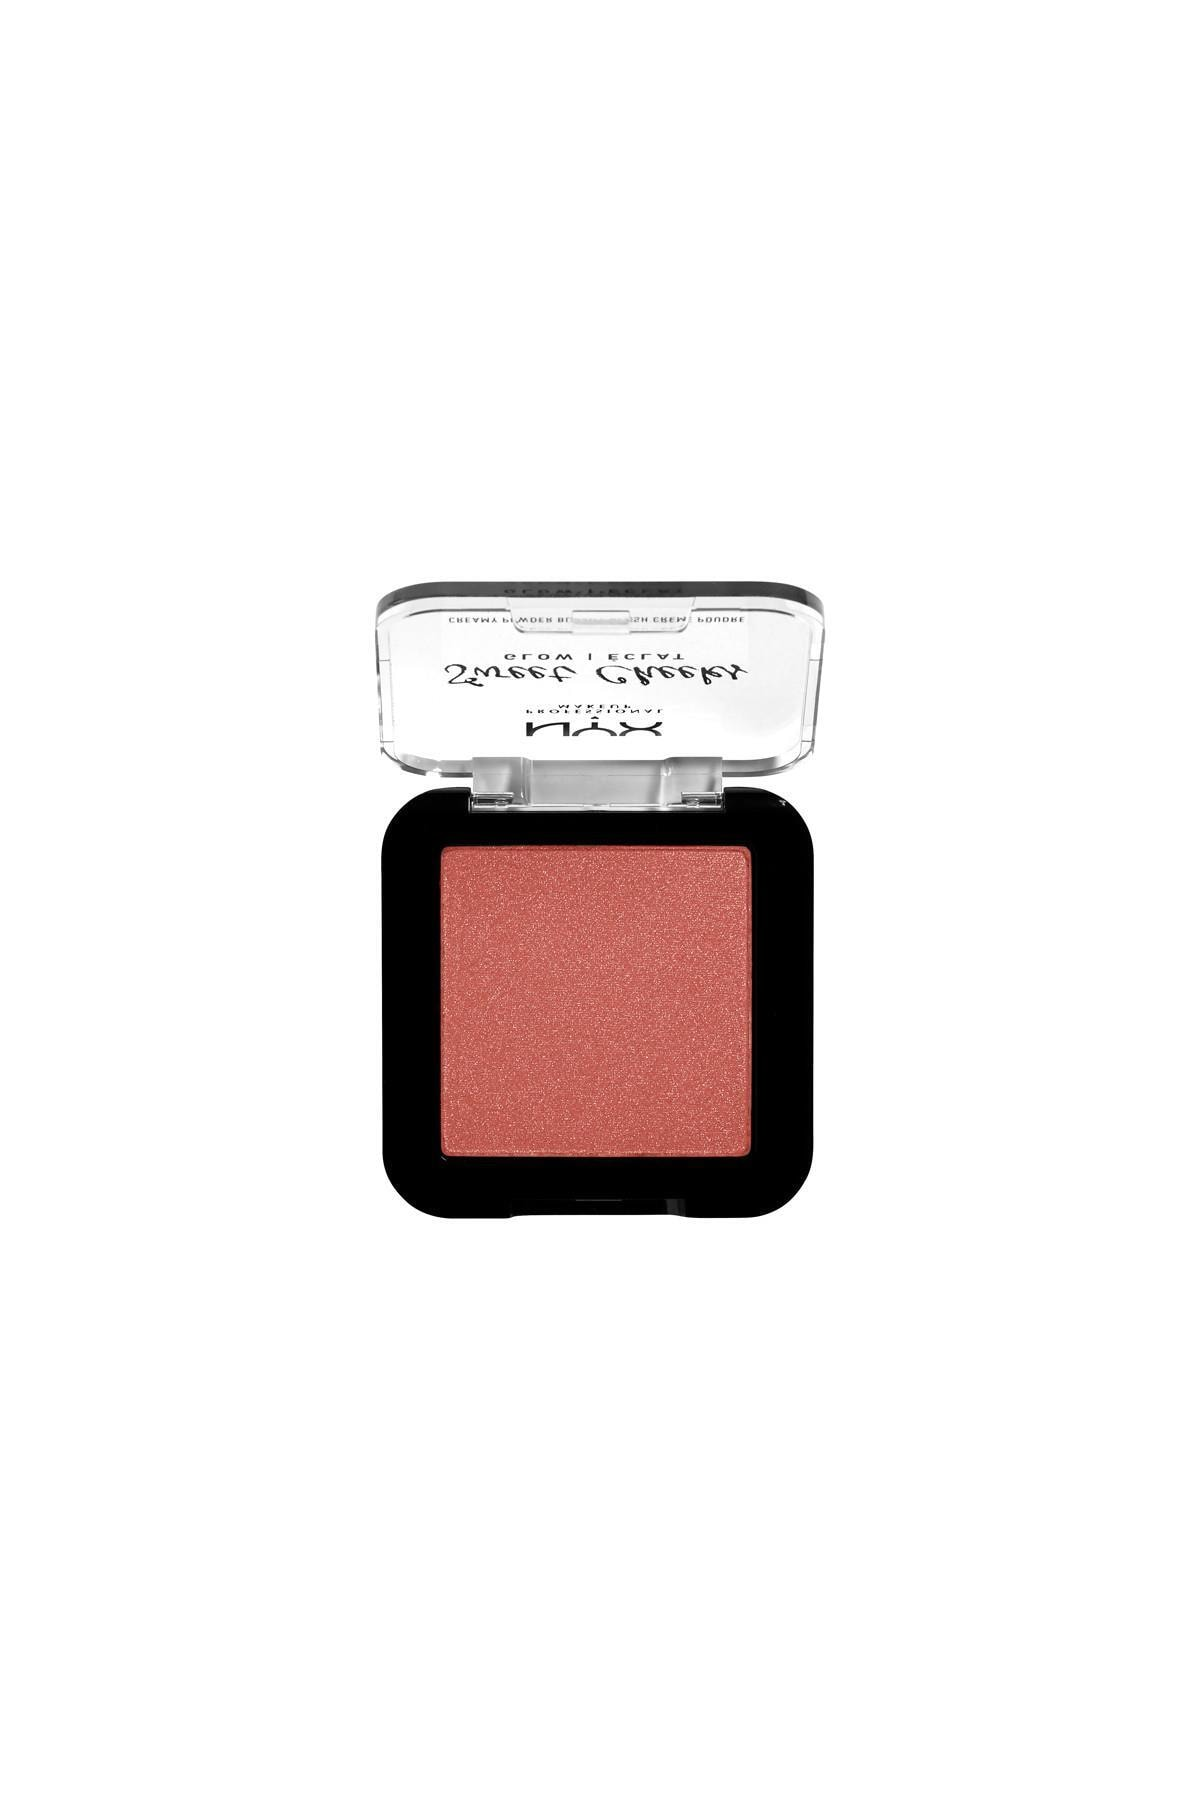 NYX Professional Makeup Işıltı Veren Allık - Sweet Cheeks Creamy Powder Blush Glow - Summer Breeze 800897192372 0